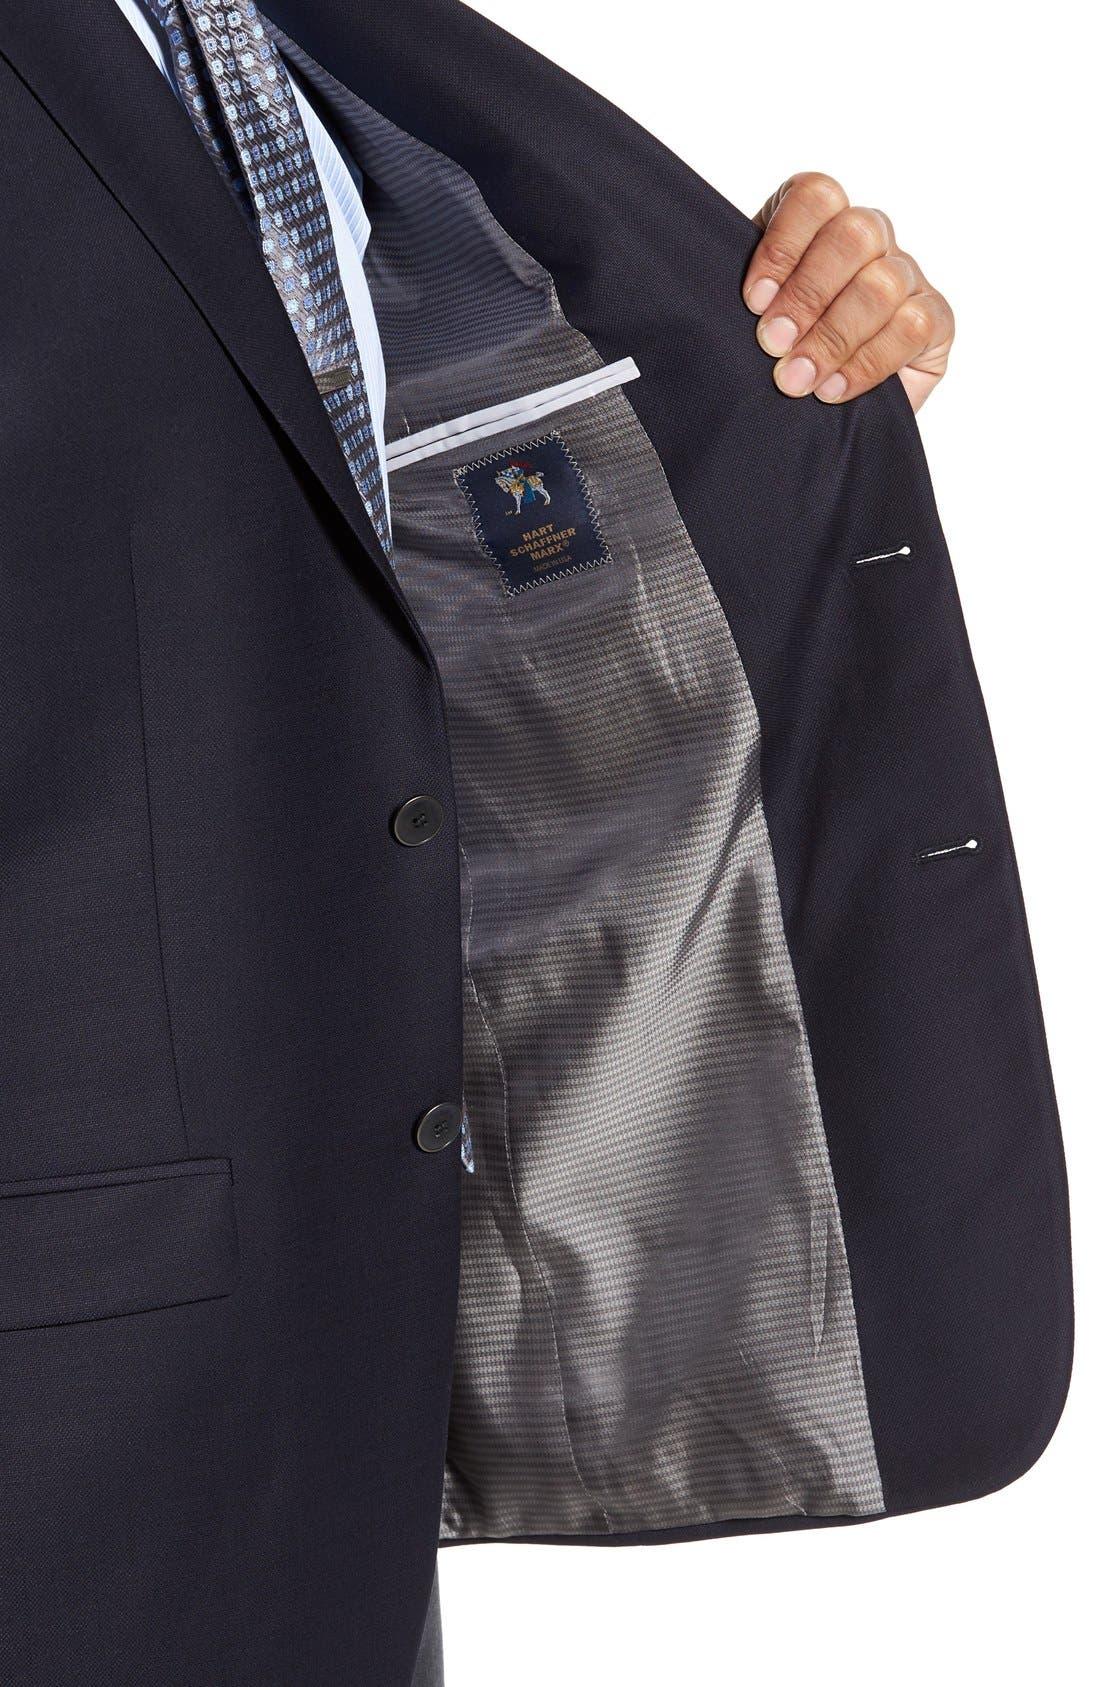 HART SCHAFFNER MARX, New York Classic Fit Wool Blend Blazer, Alternate thumbnail 8, color, NAVY